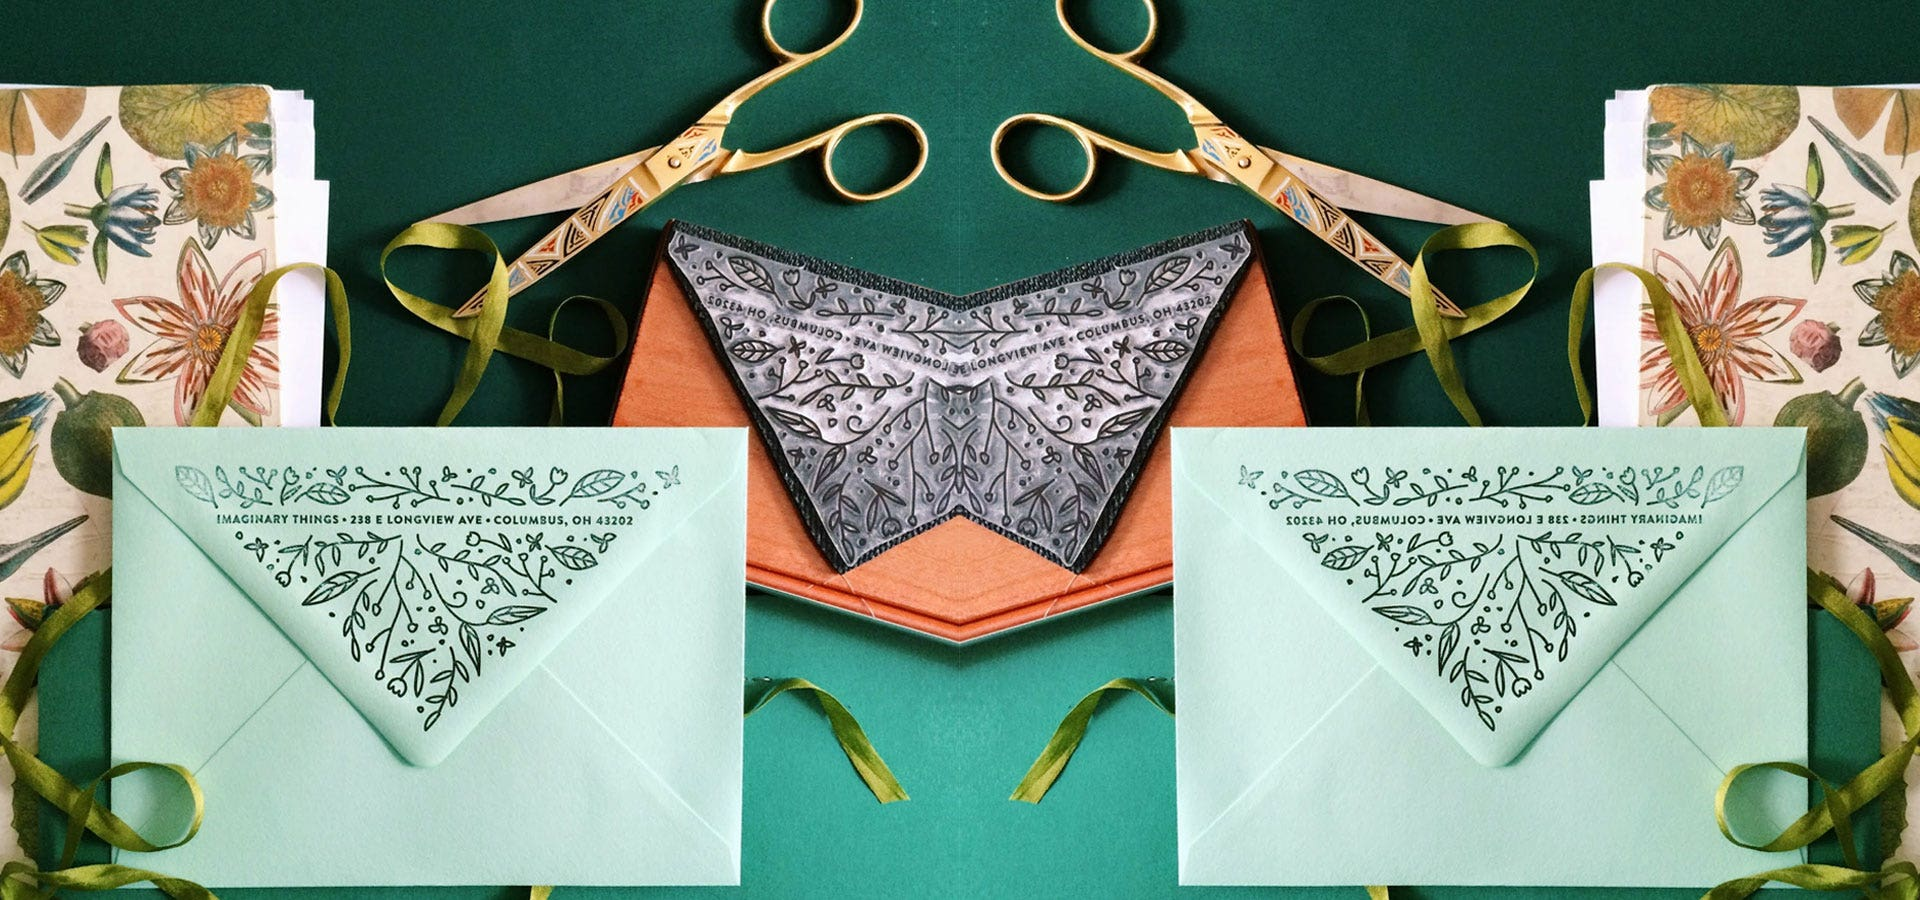 21+ Creative Envelope Designs - PSD, AI, In Design, JPG ...